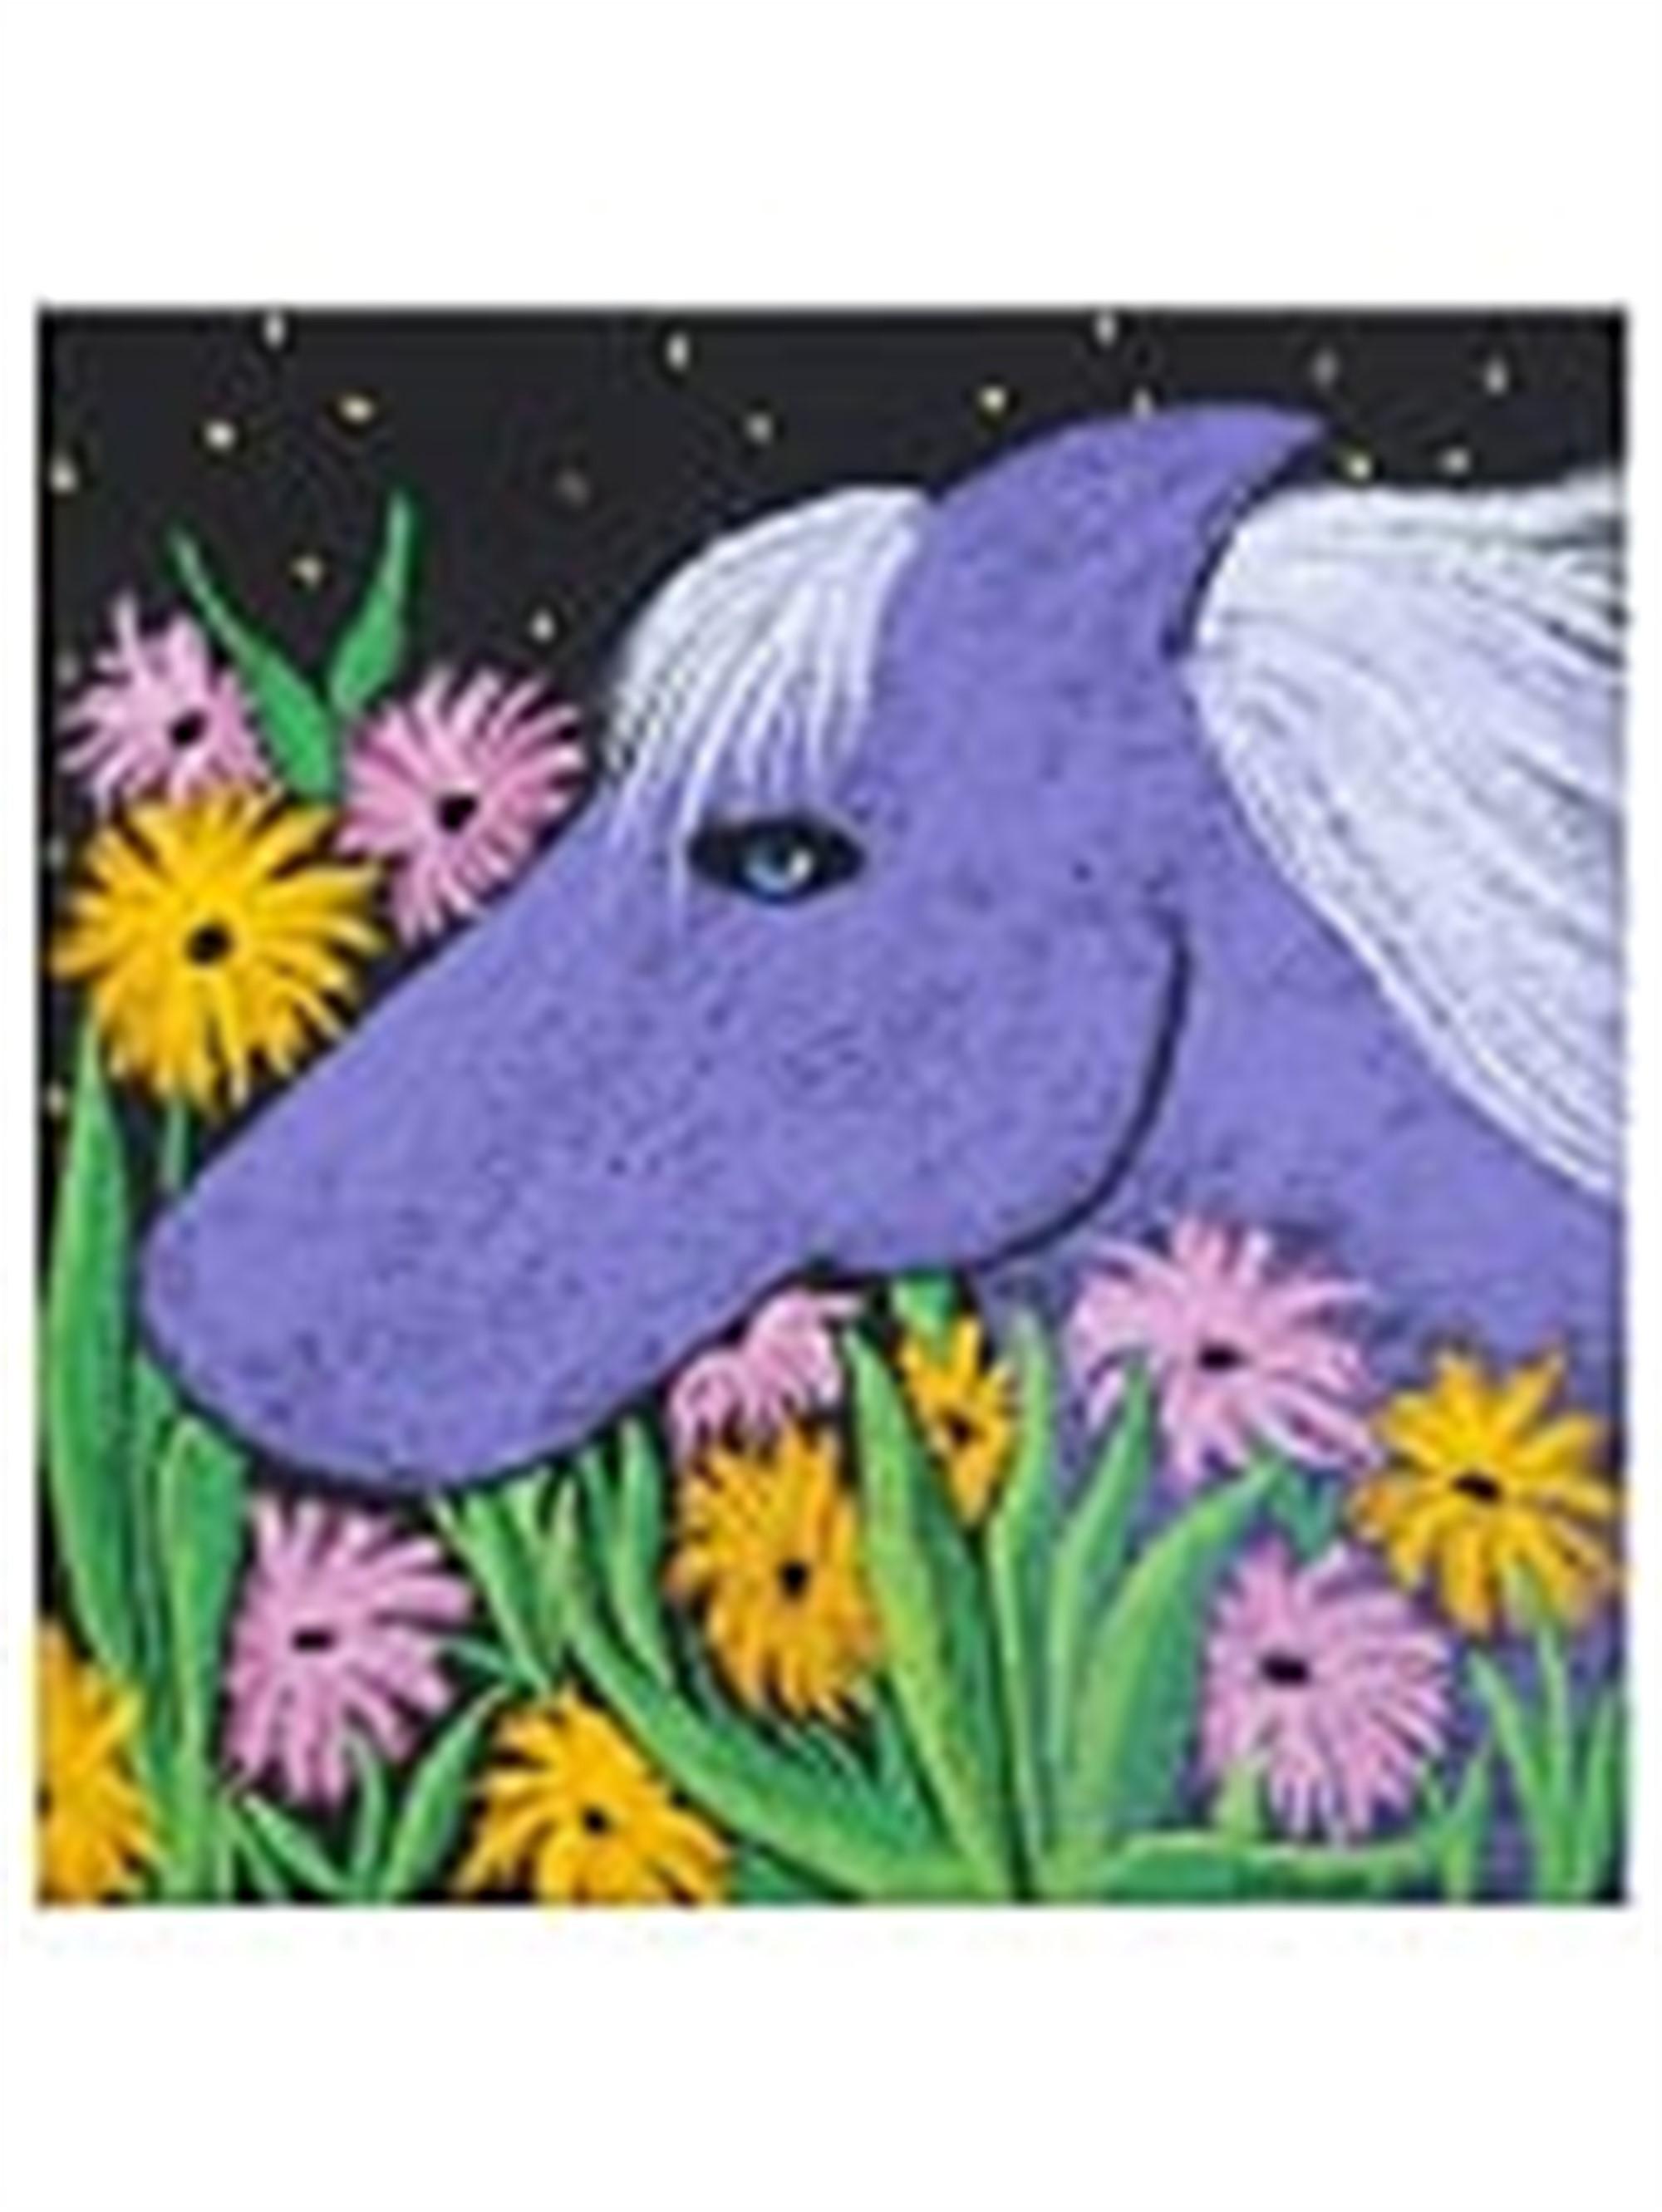 From: The Night Garden 'Purple Pony' by Carole LaRoche